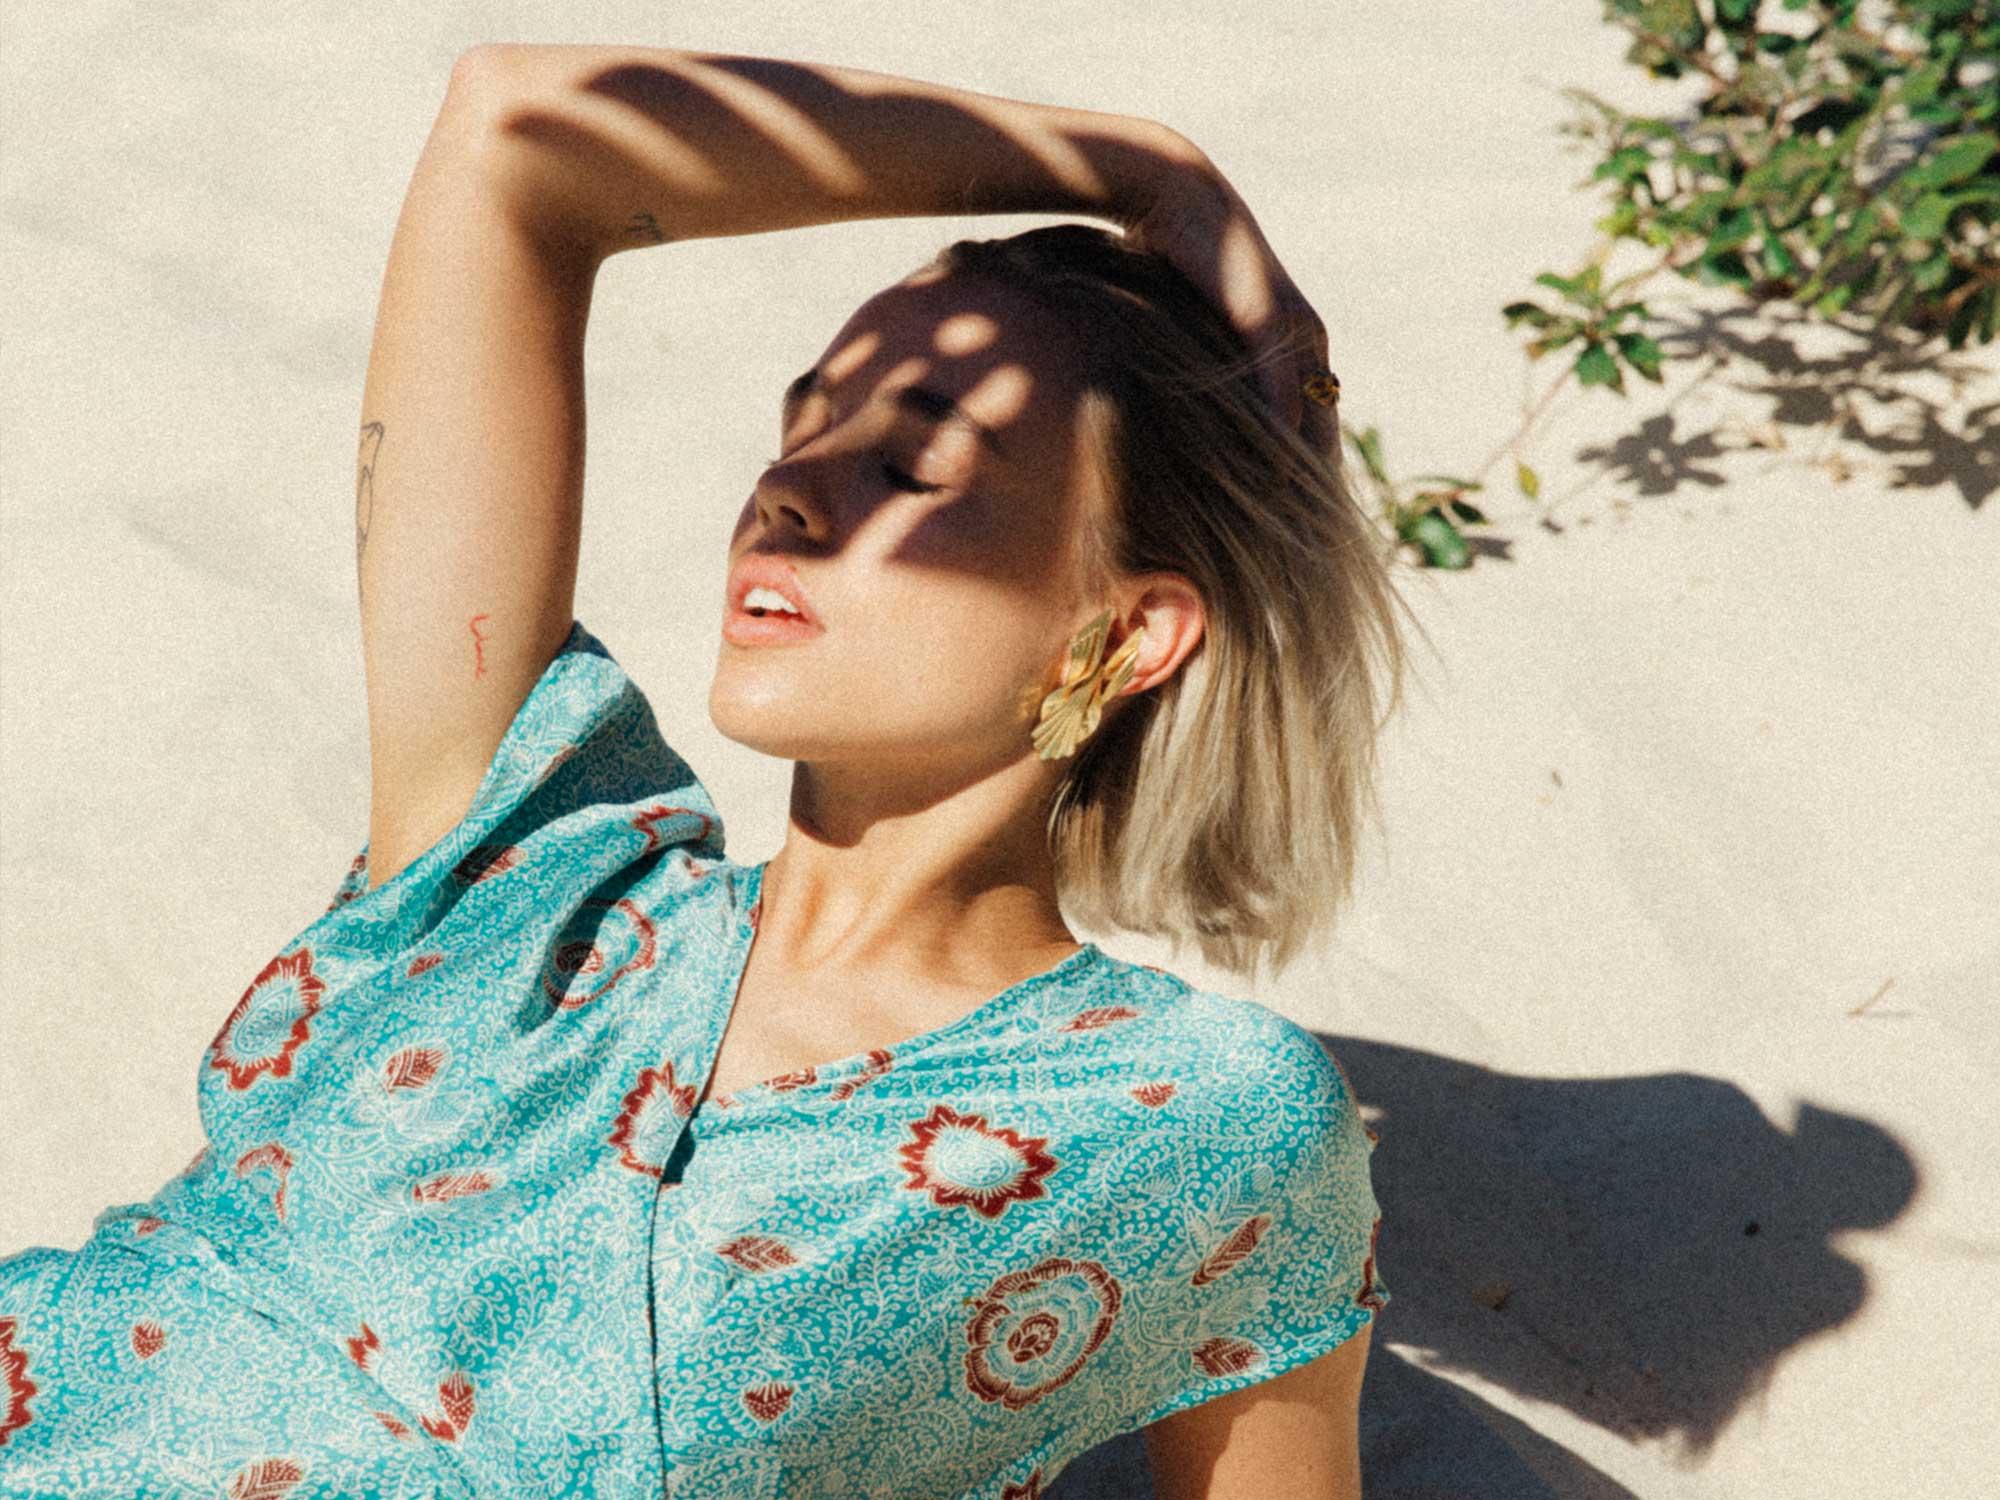 Nusa-Indah-Clothing-Jade-Silk-Dress-L005.jpg